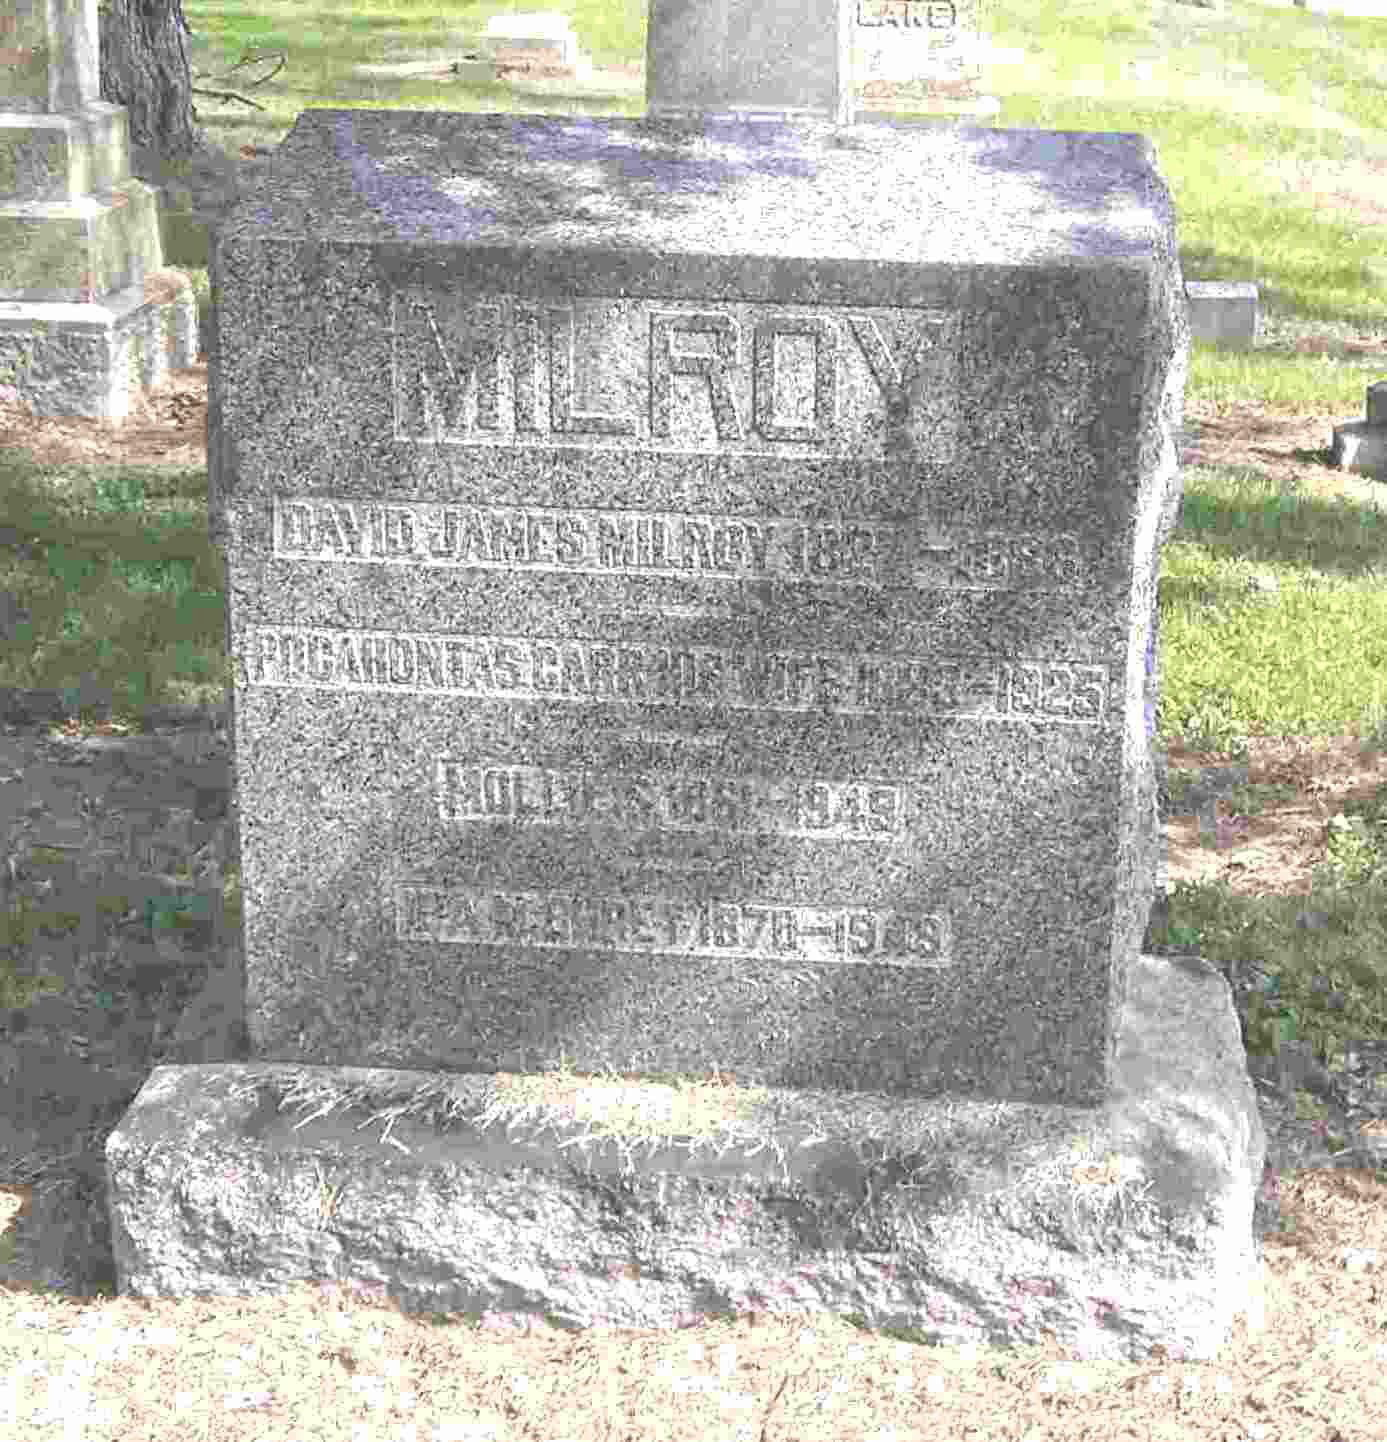 John Milroy